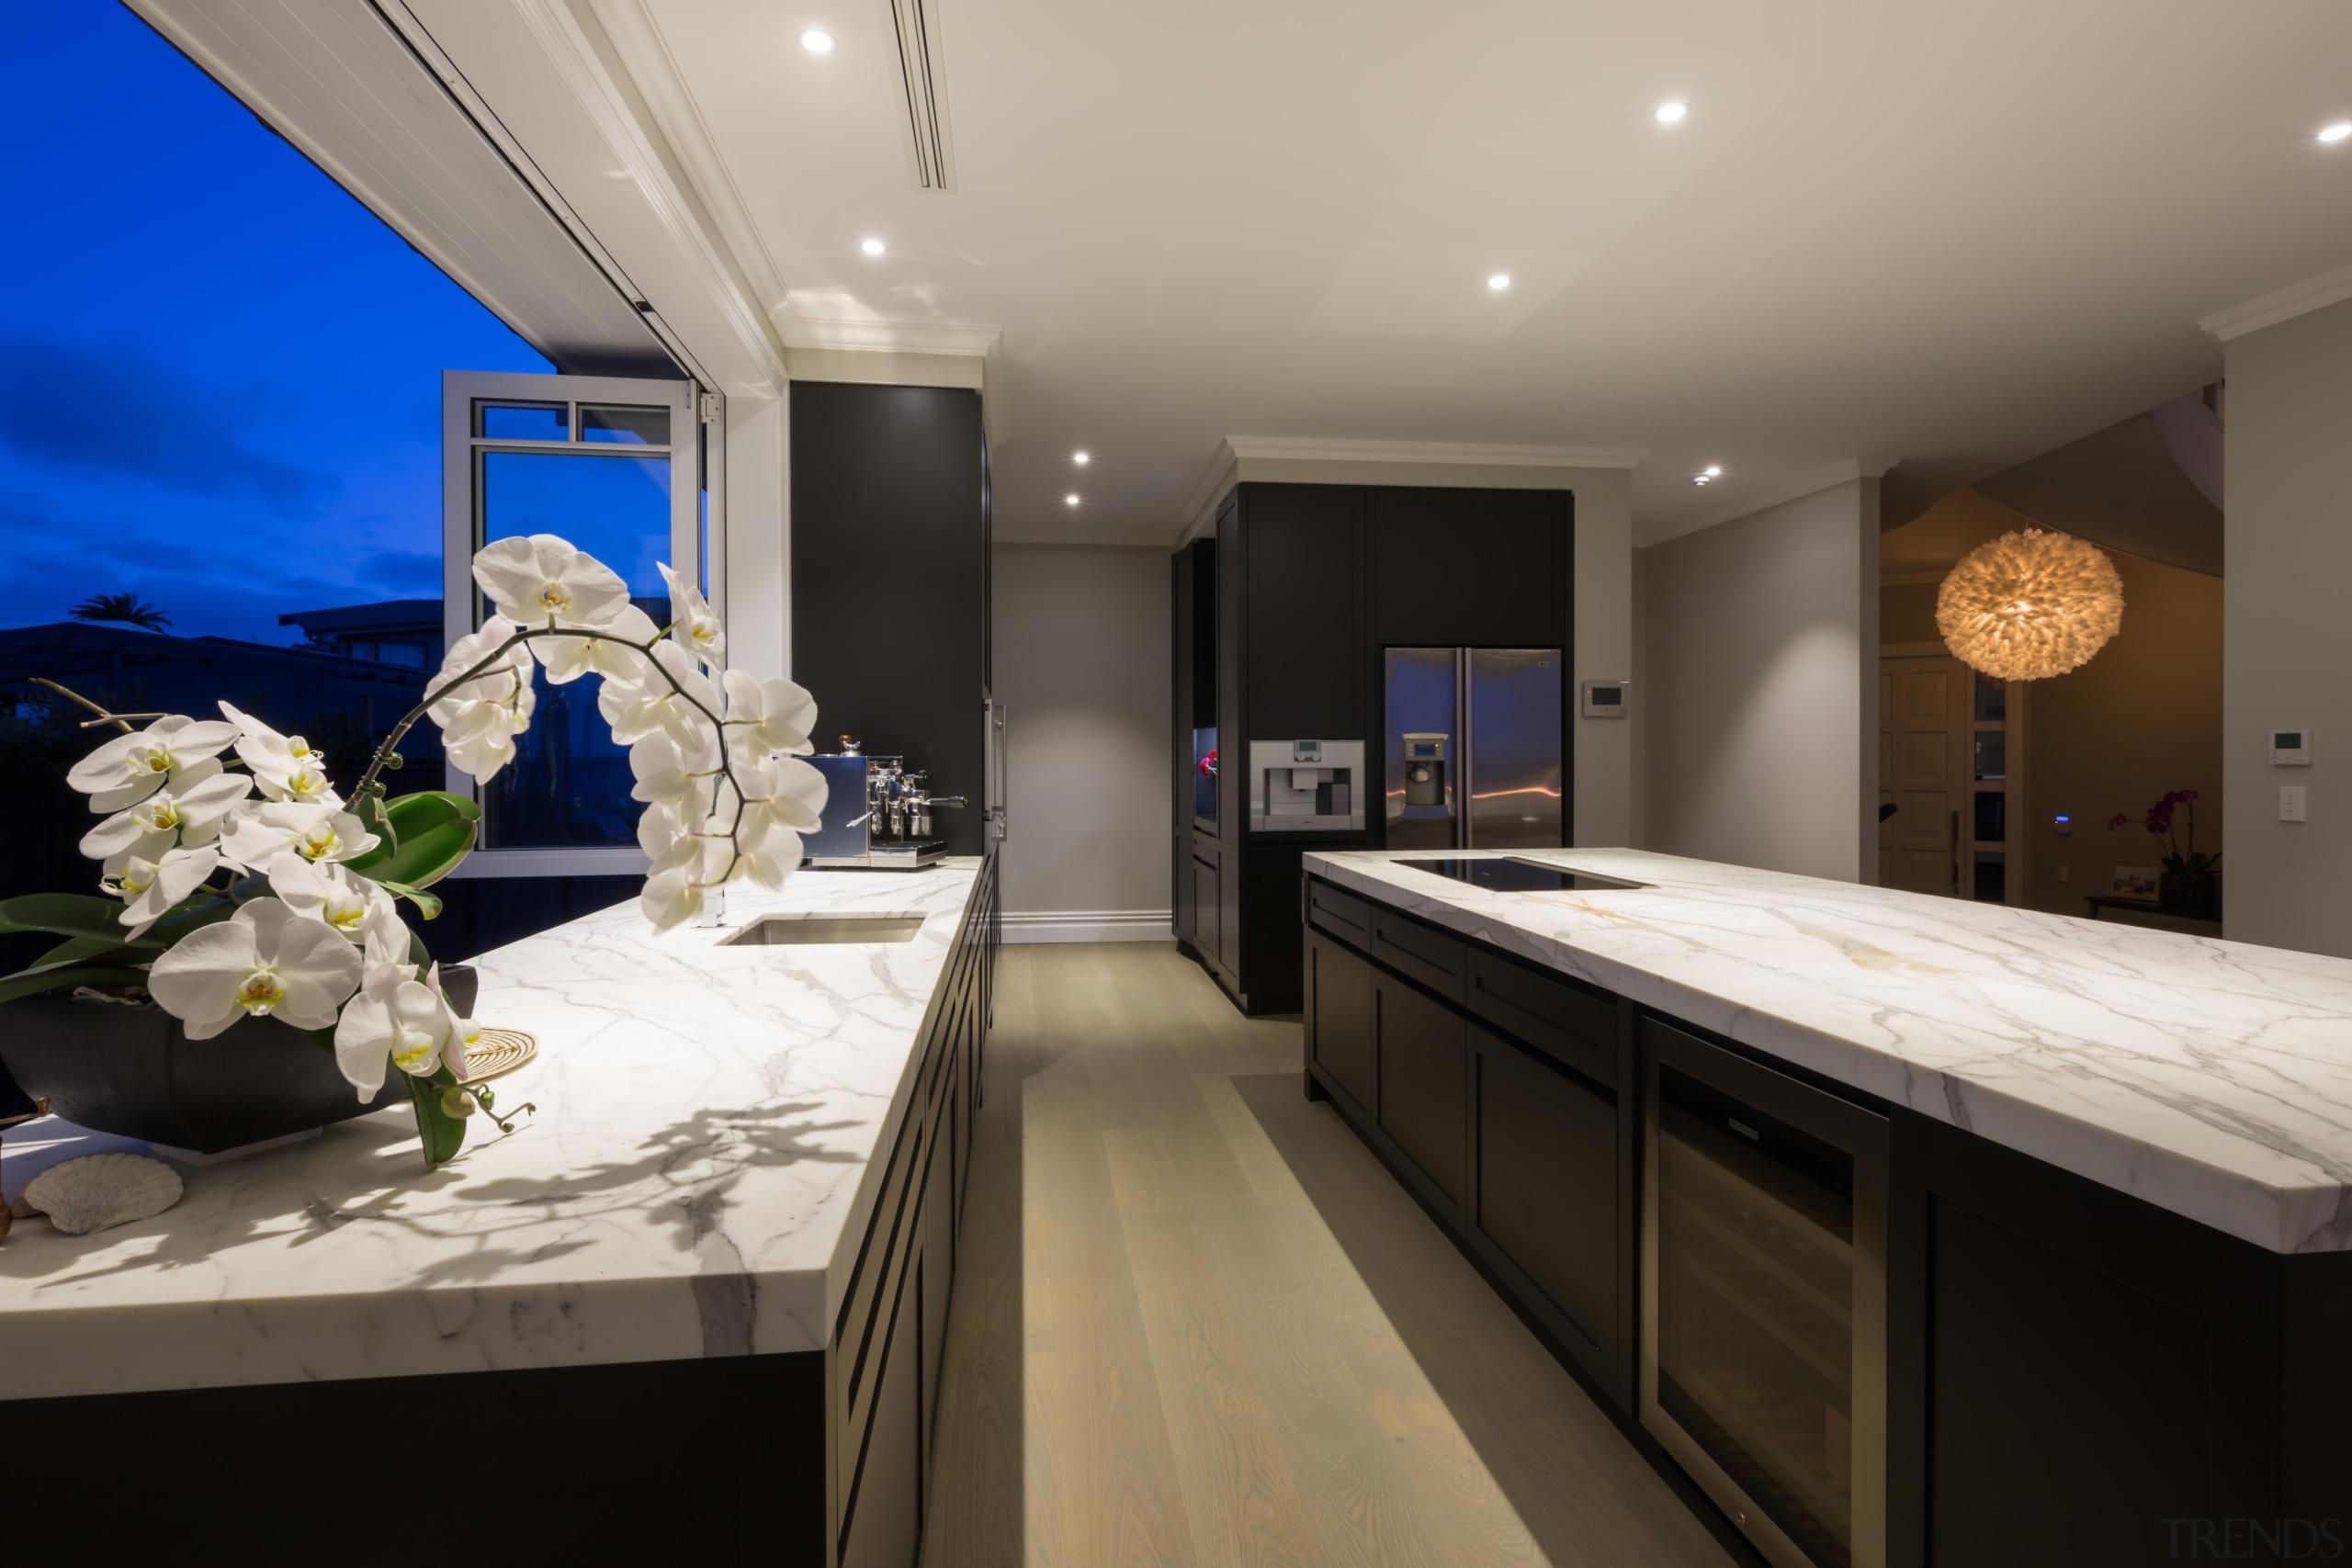 Img9017 - interior design   room   gray interior design, room, gray, black